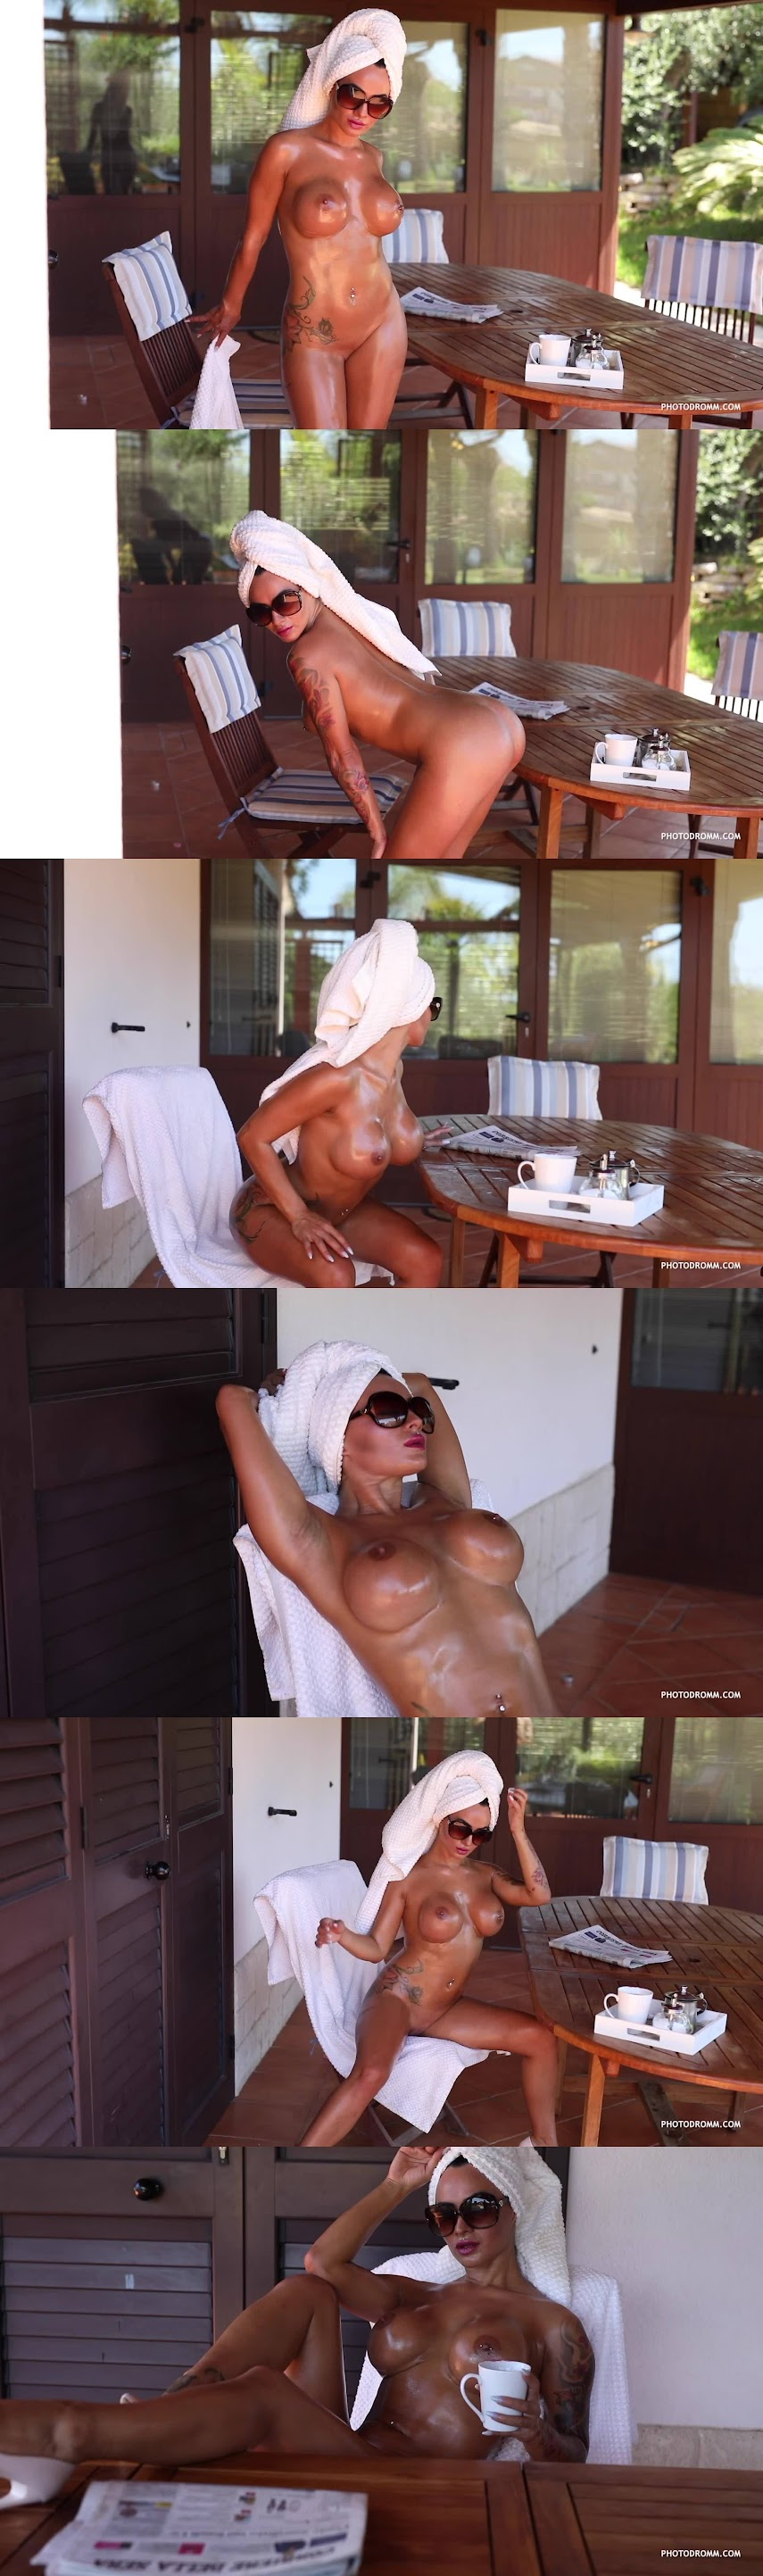 [PhotoDromm] Trudy - Breakfast Club sexy girls image jav